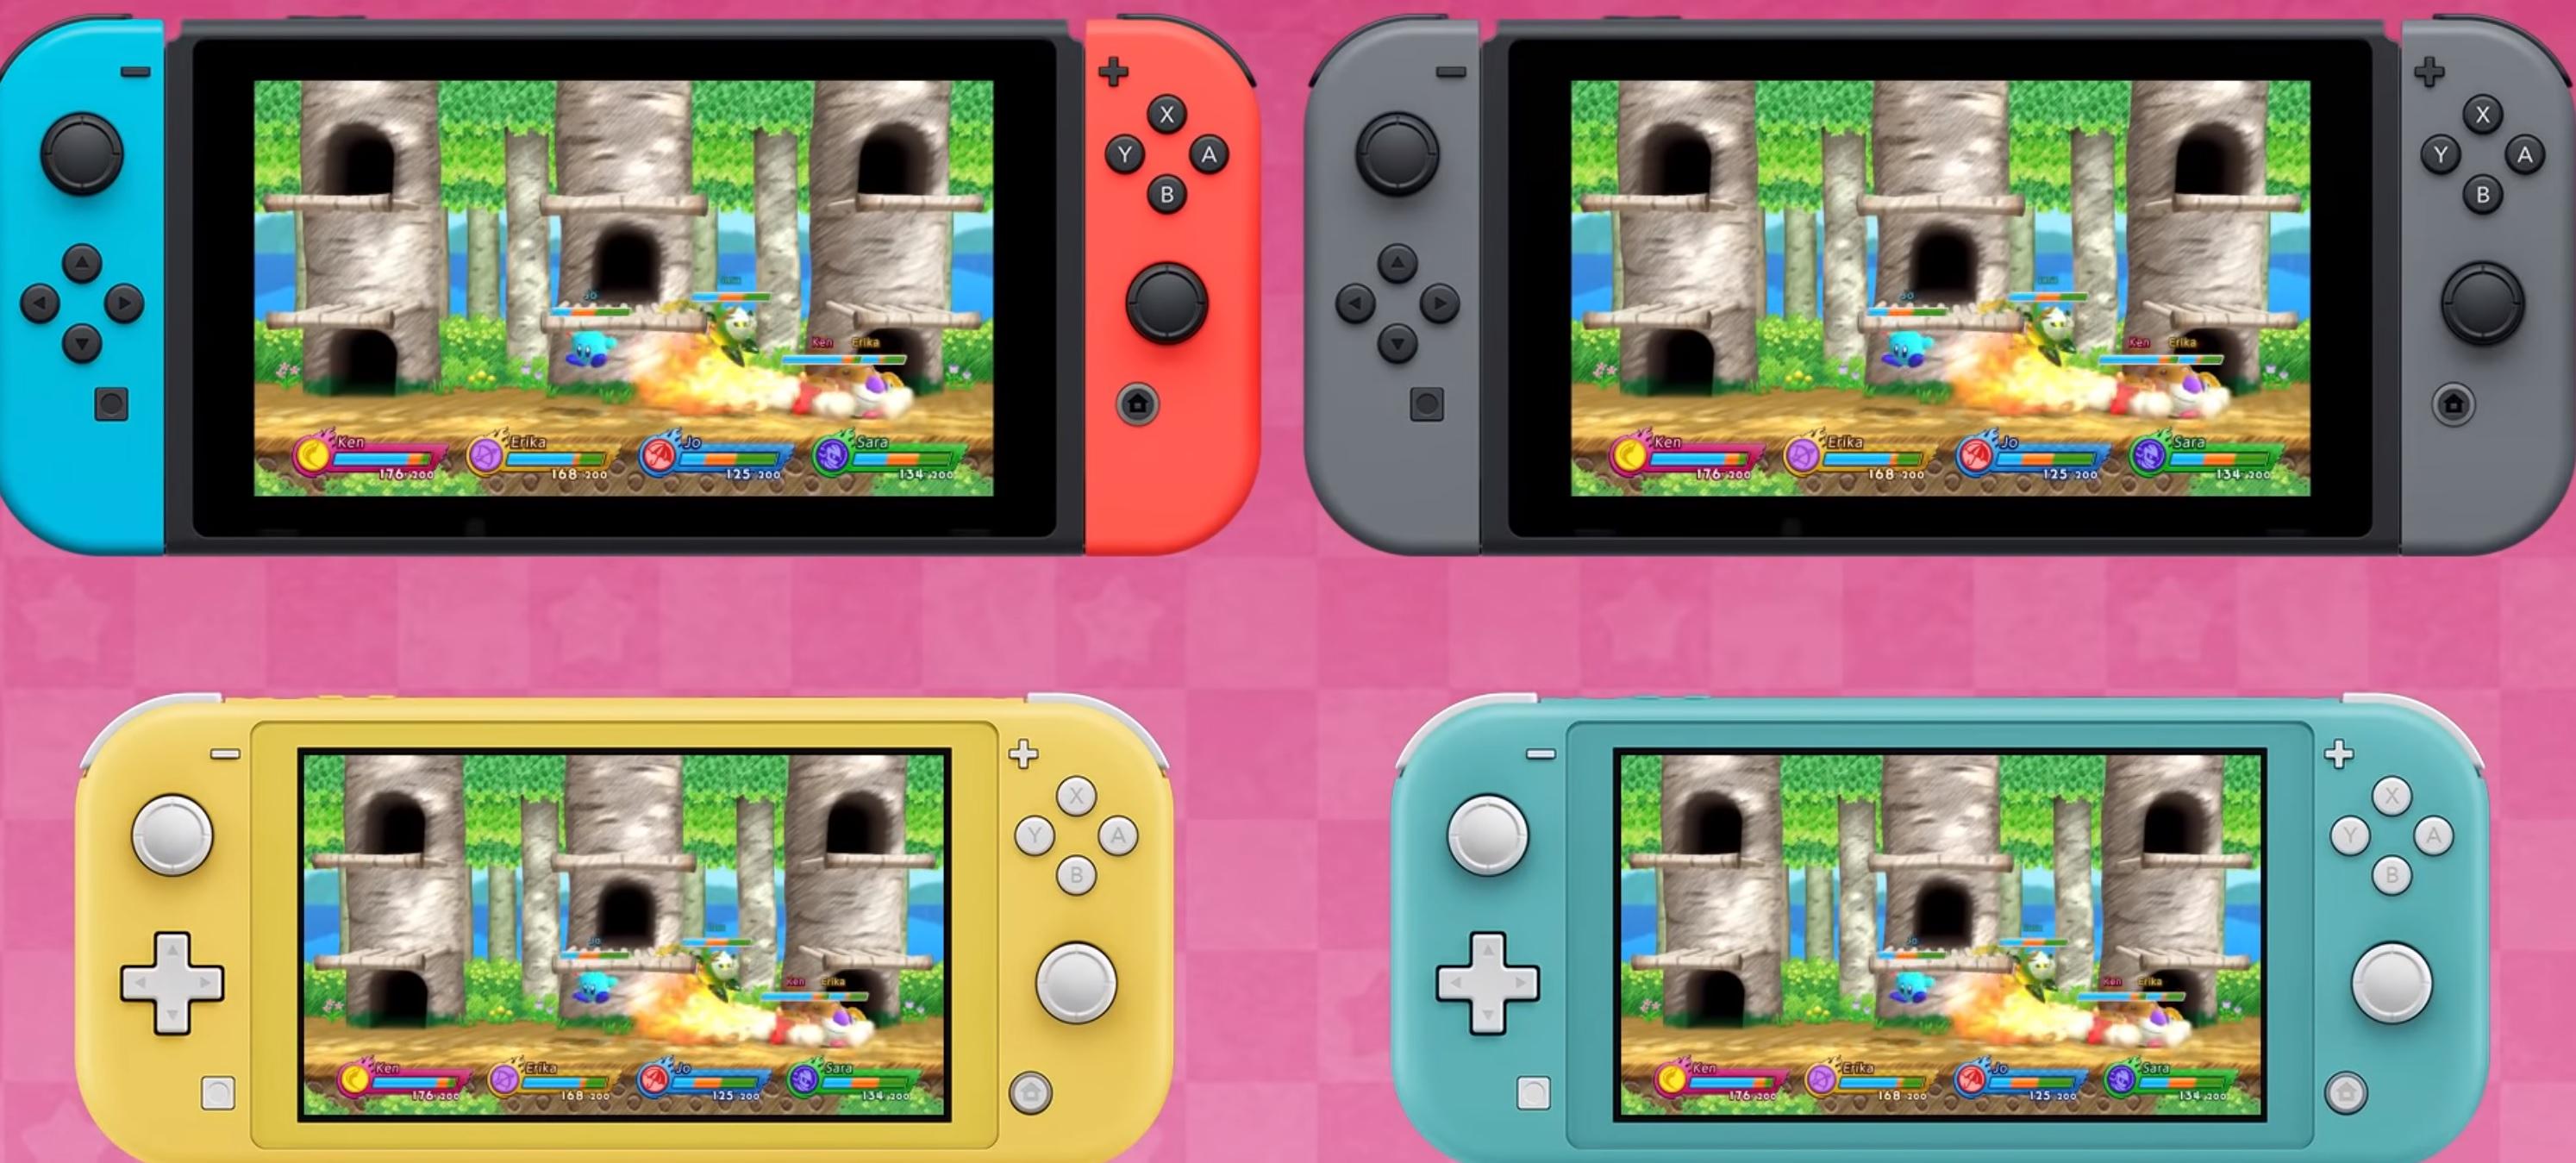 Nintendo Download: Kirby Fighters 2 screenshot